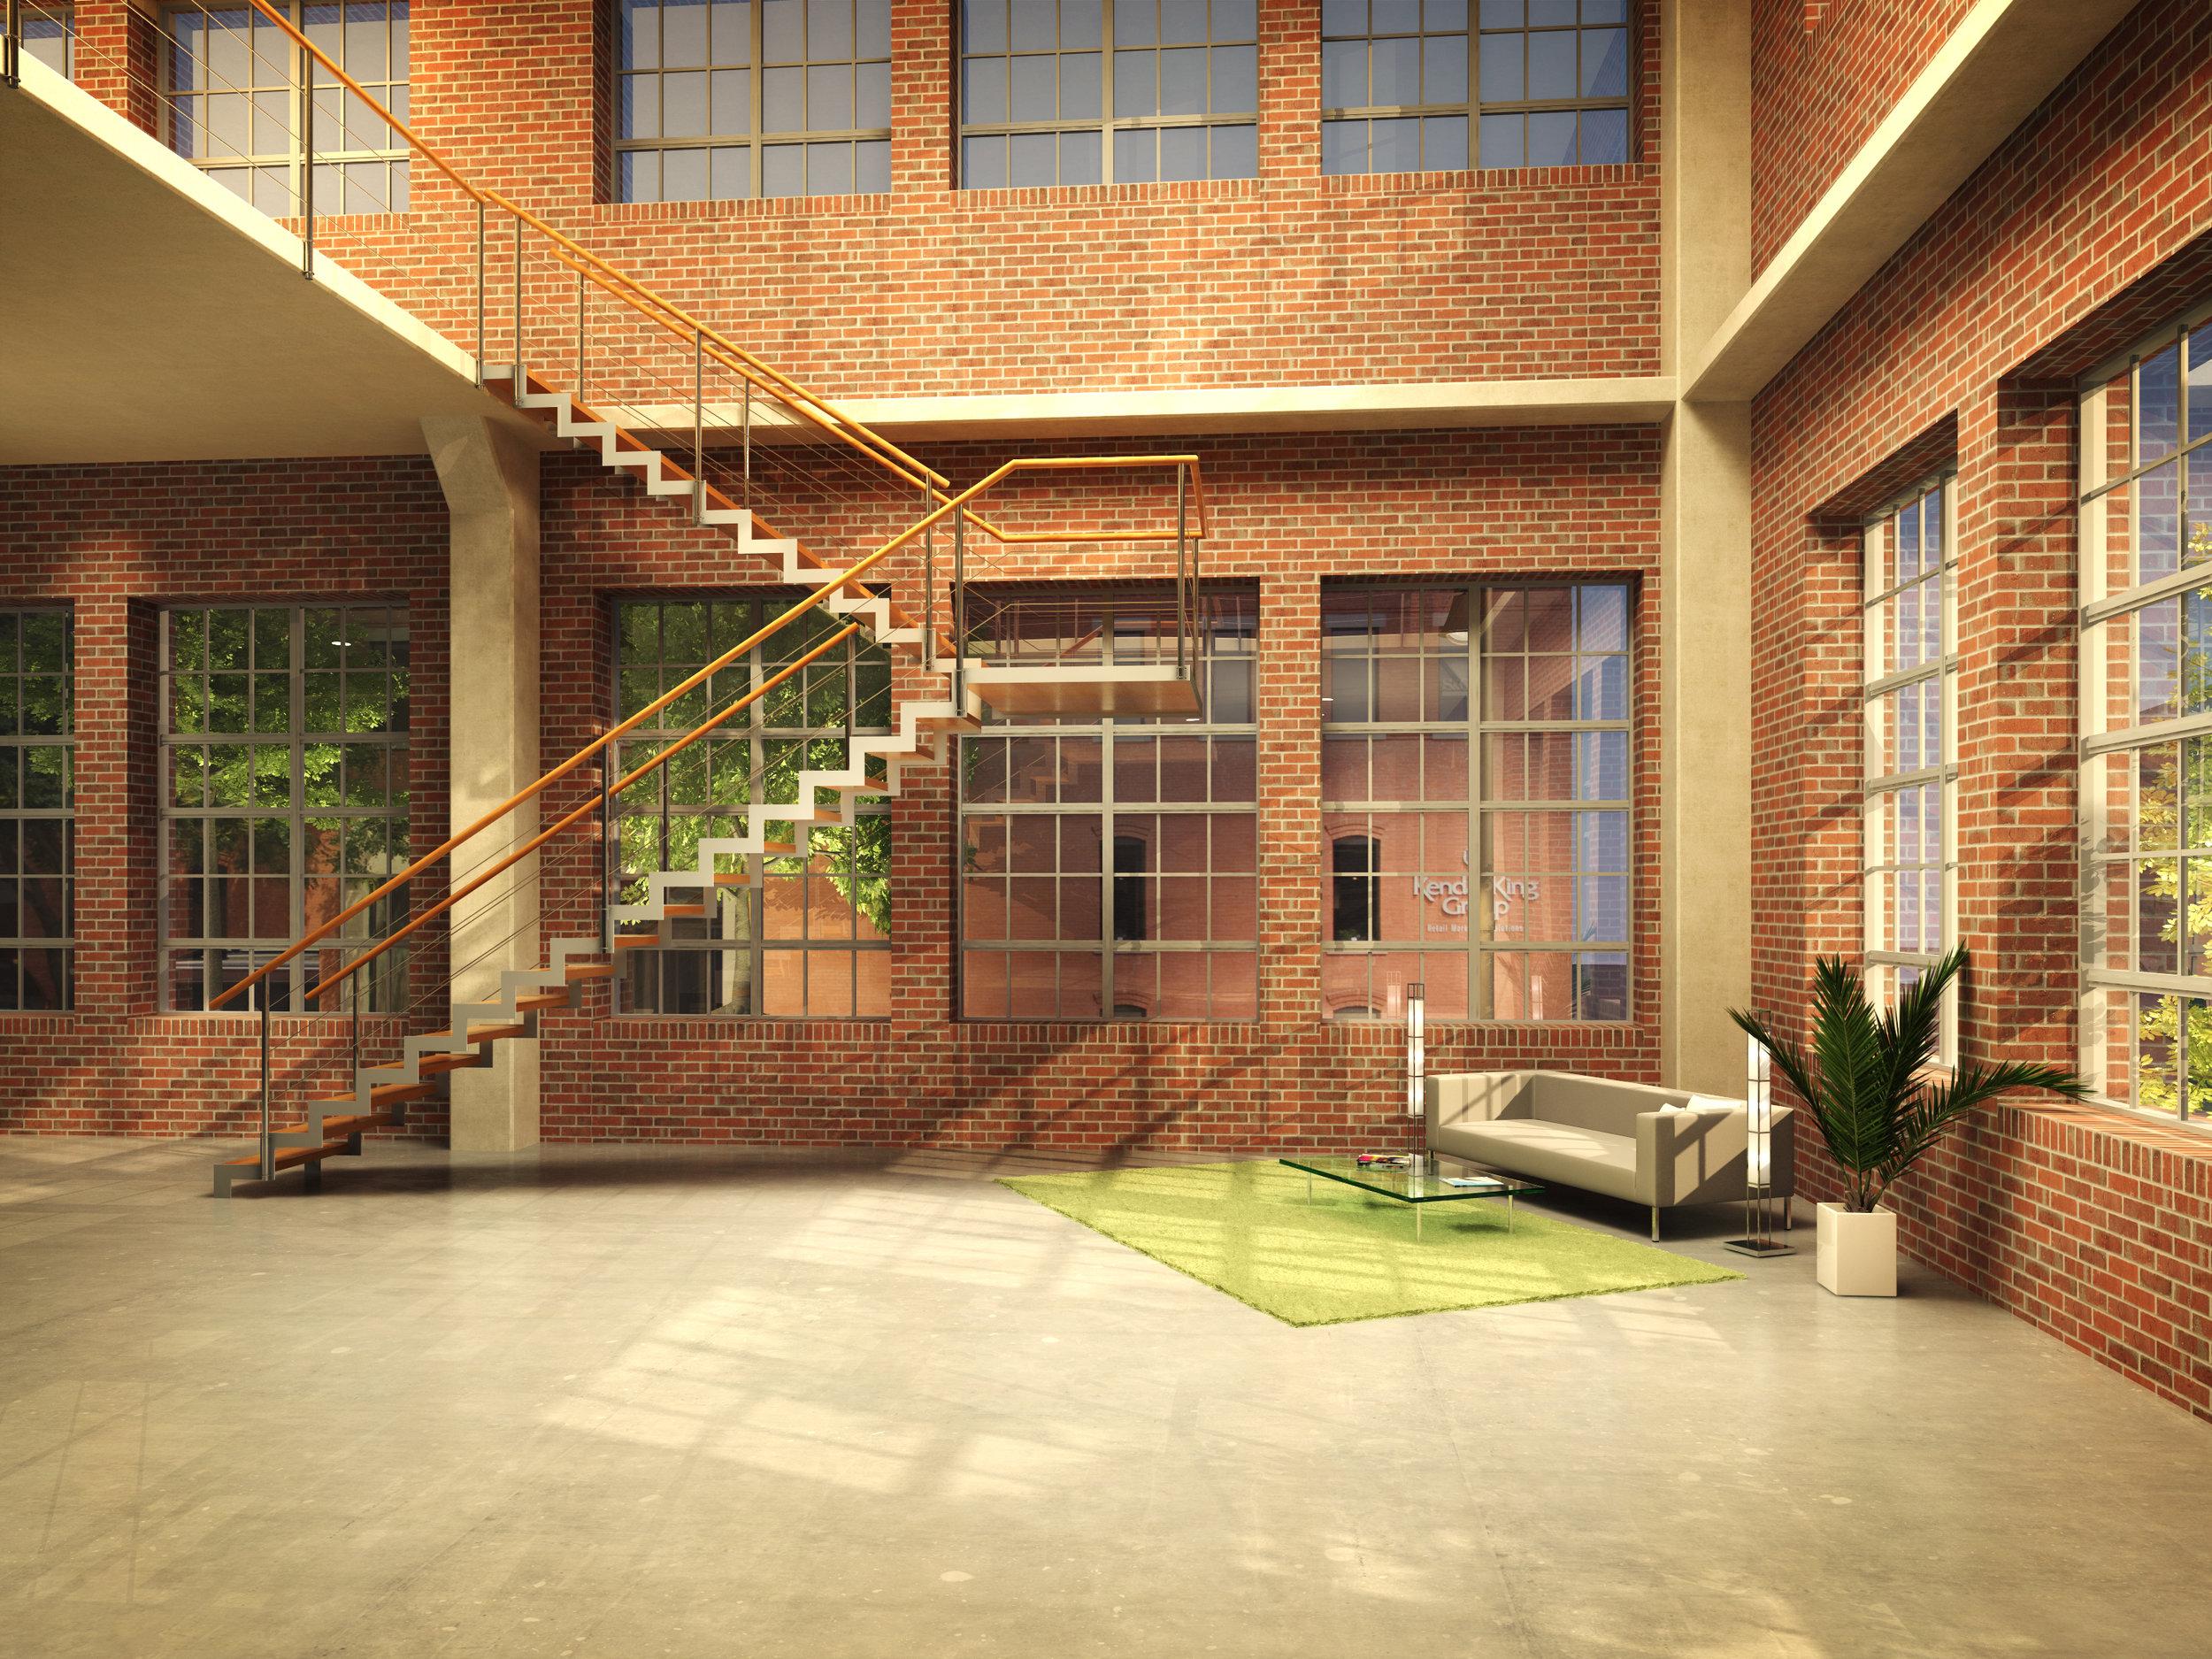 CC_Interior_03 Brick.jpg